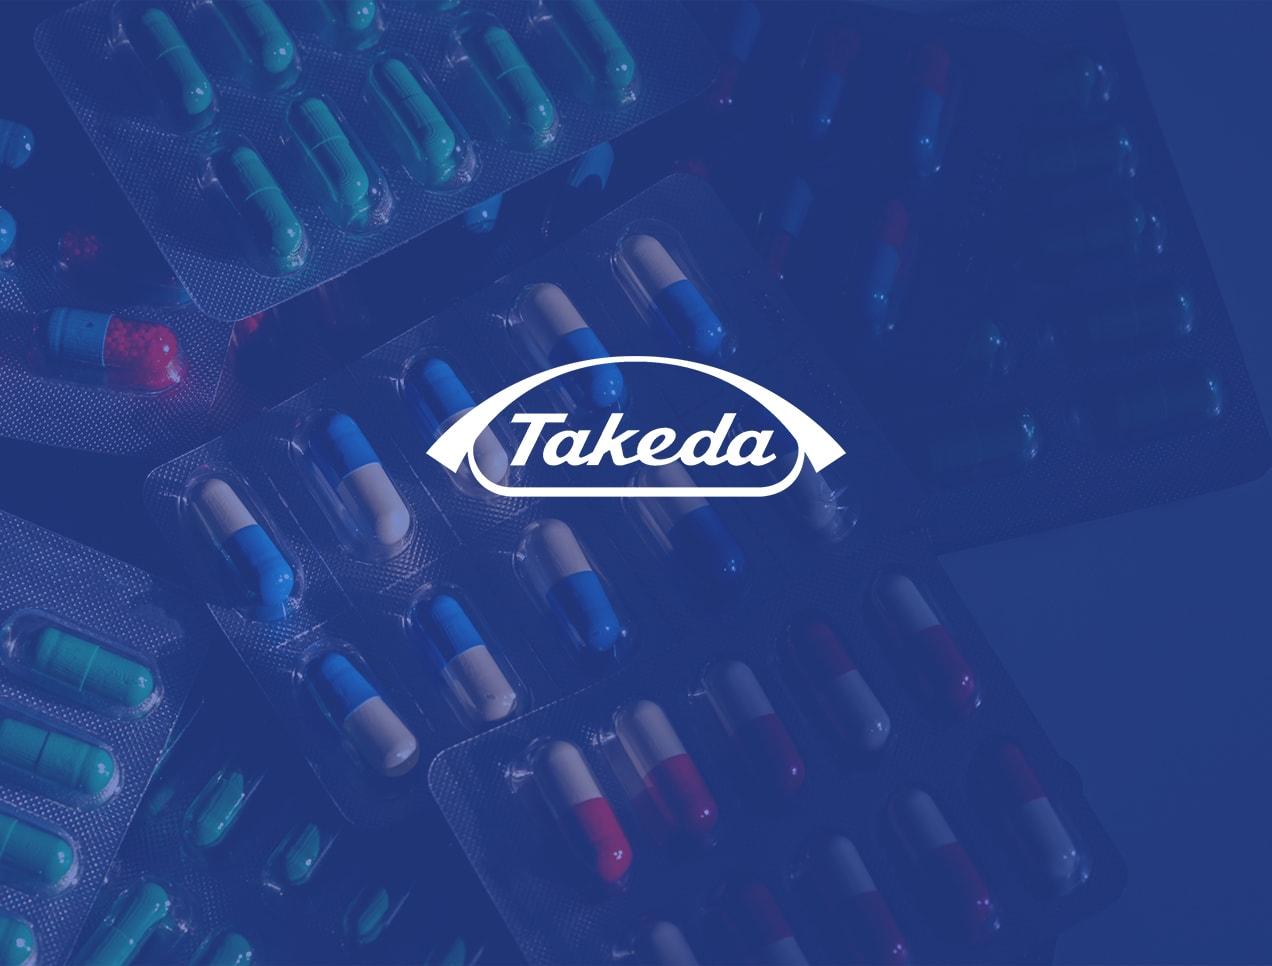 Takeda - Hoshin facilitation